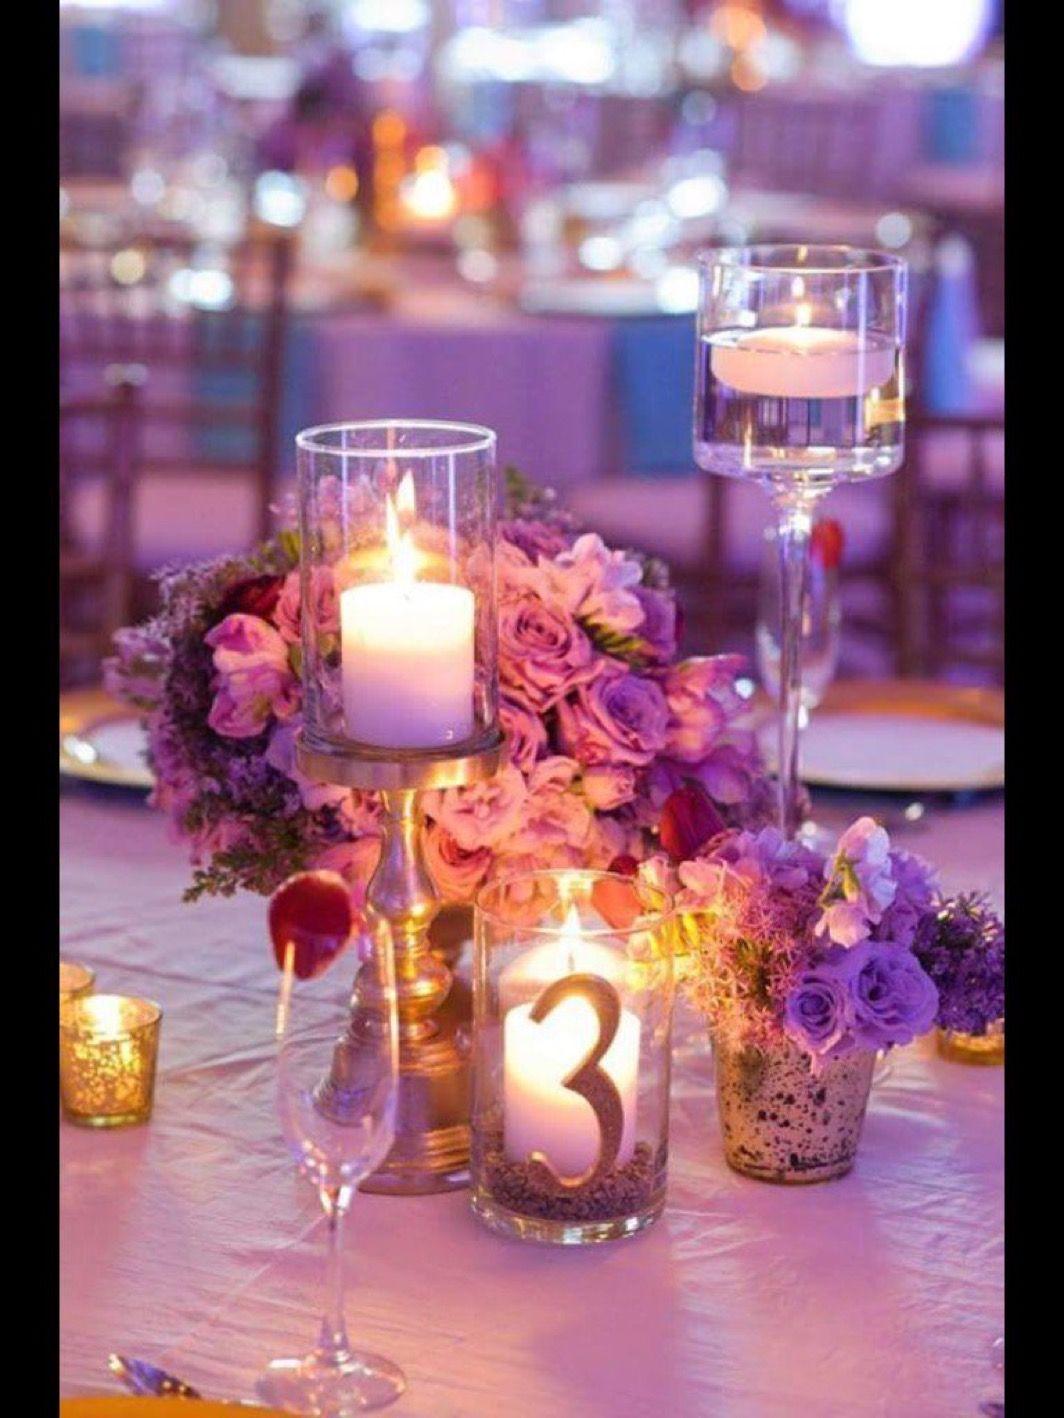 Pin by sabrina p on wedding in 2018 | Pinterest | Diy wedding ...